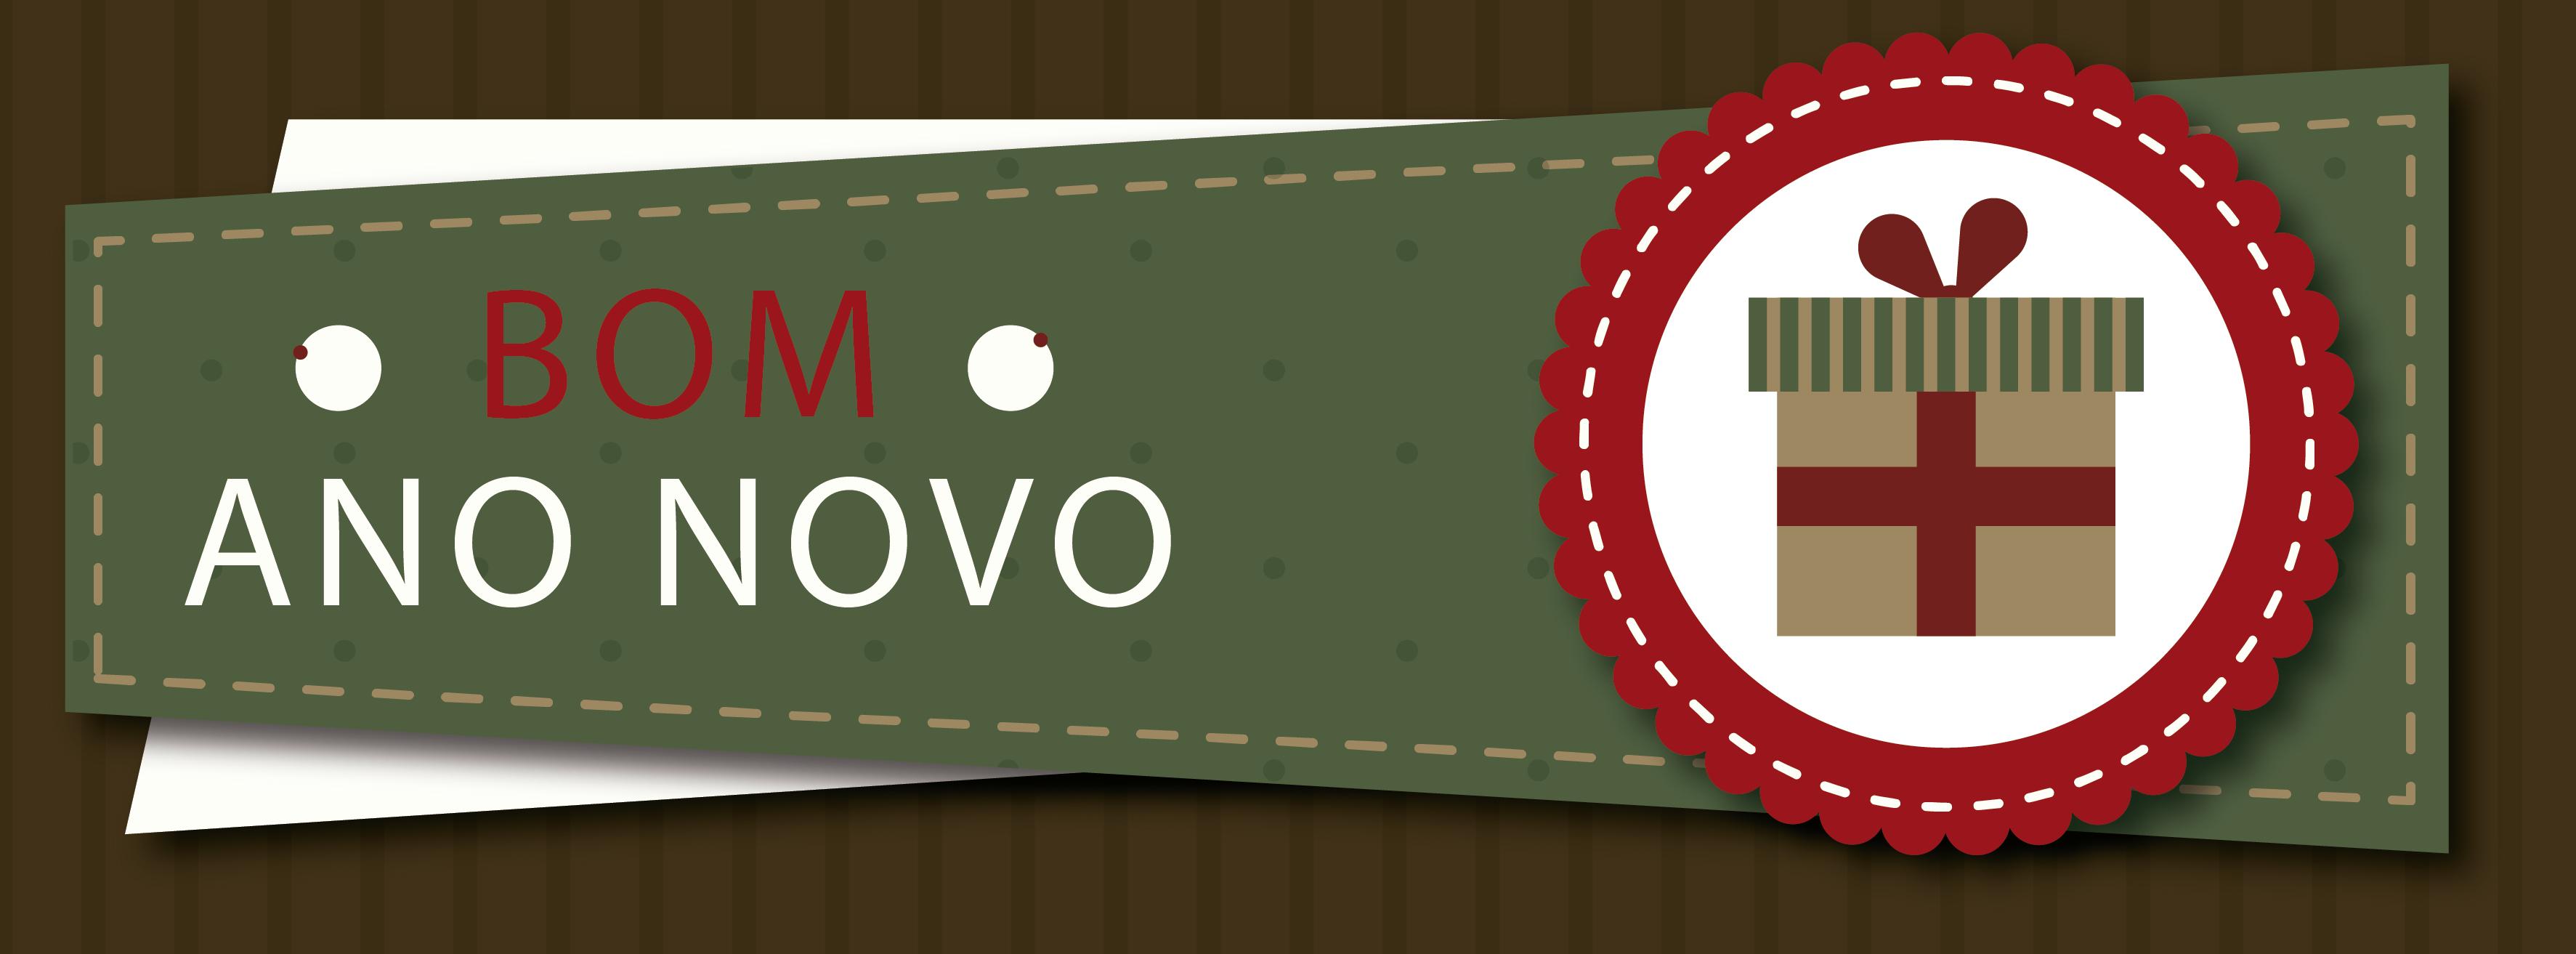 banner-BOM-ANO-NOVO-FV-01